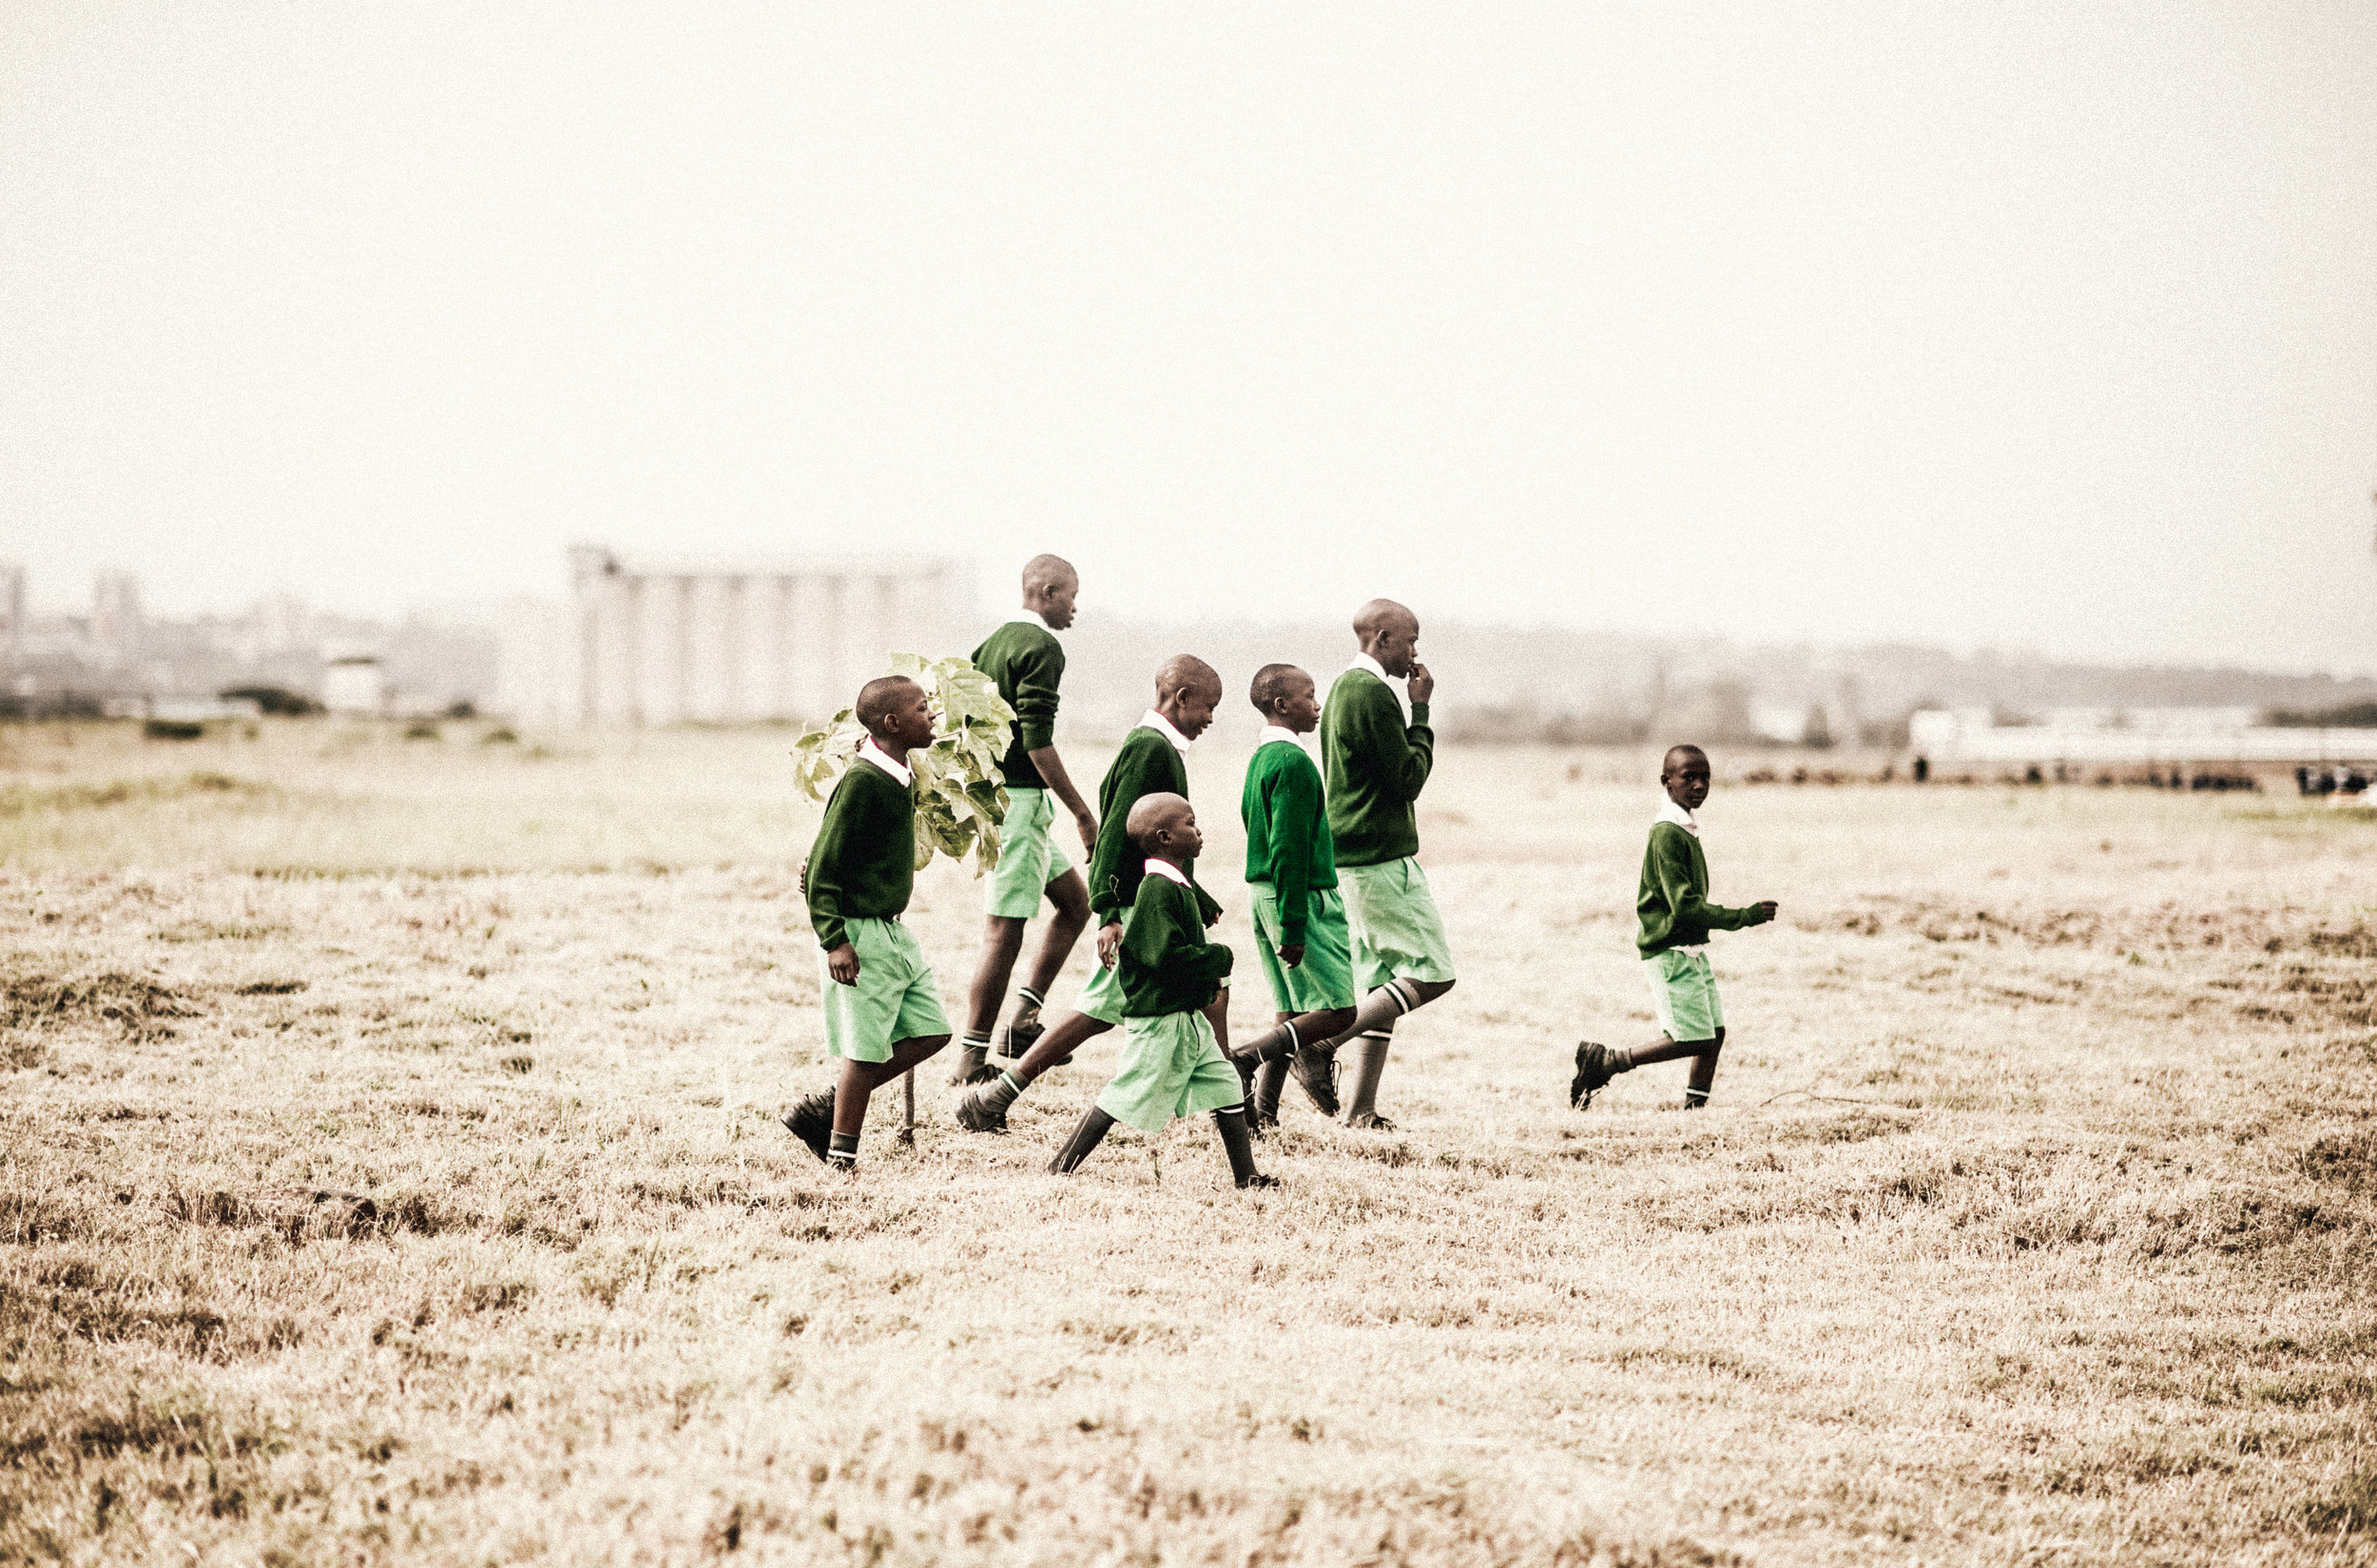 Dapper-Lou-Kenya-Giants-of-Africa-5.jpg